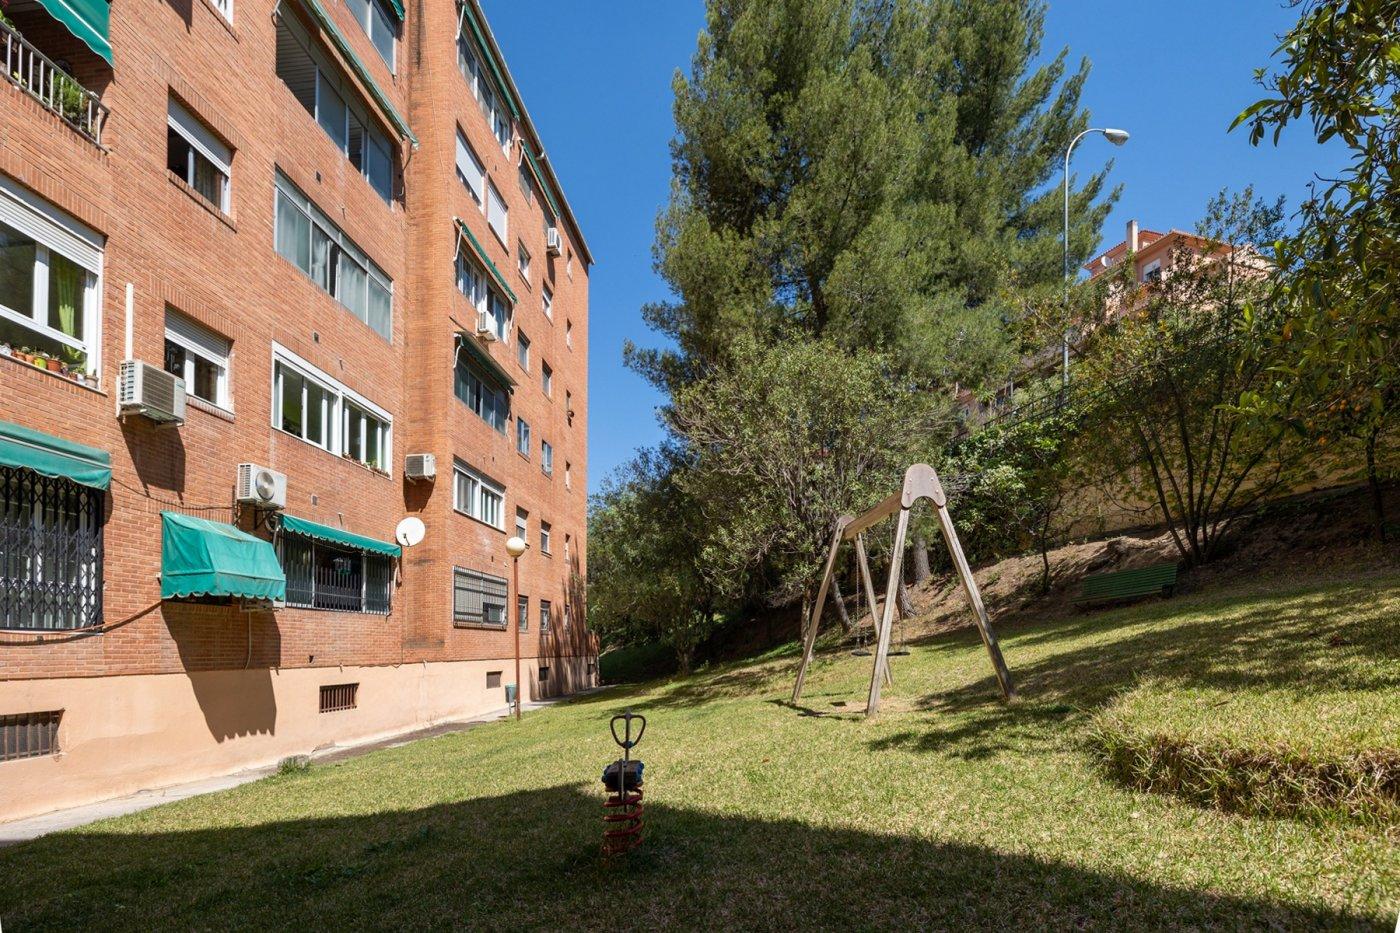 Flat for sale in Camino bajo de huetor, Granada